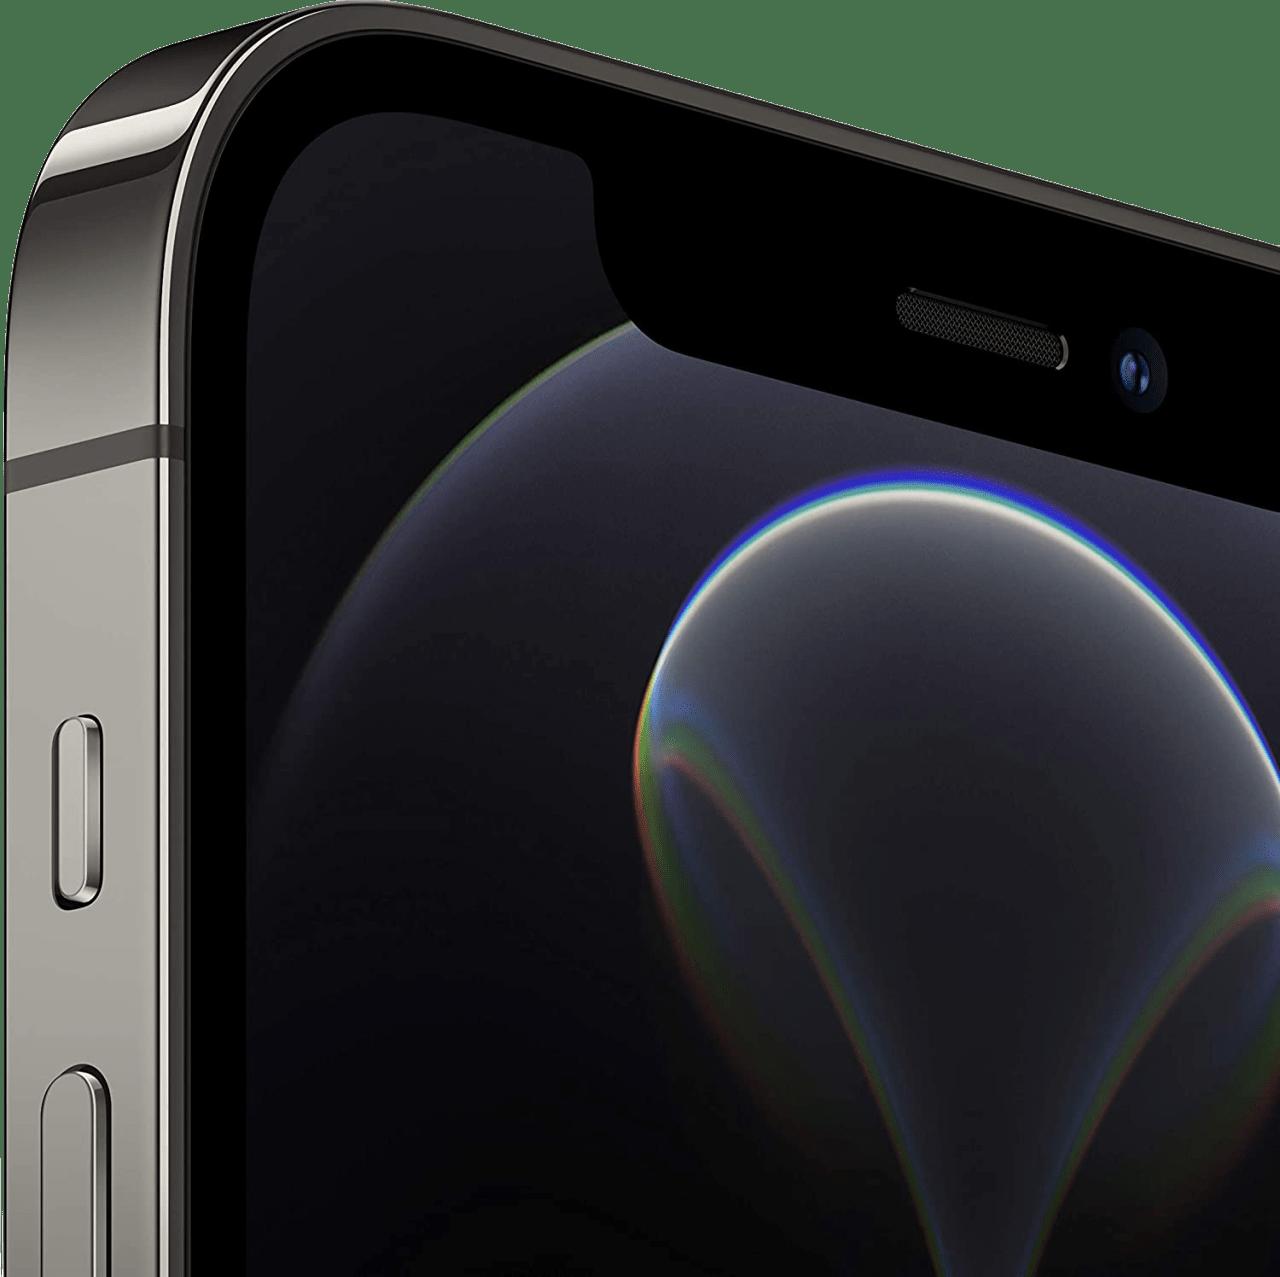 Grau Apple iPhone 12 Pro 128GB.4